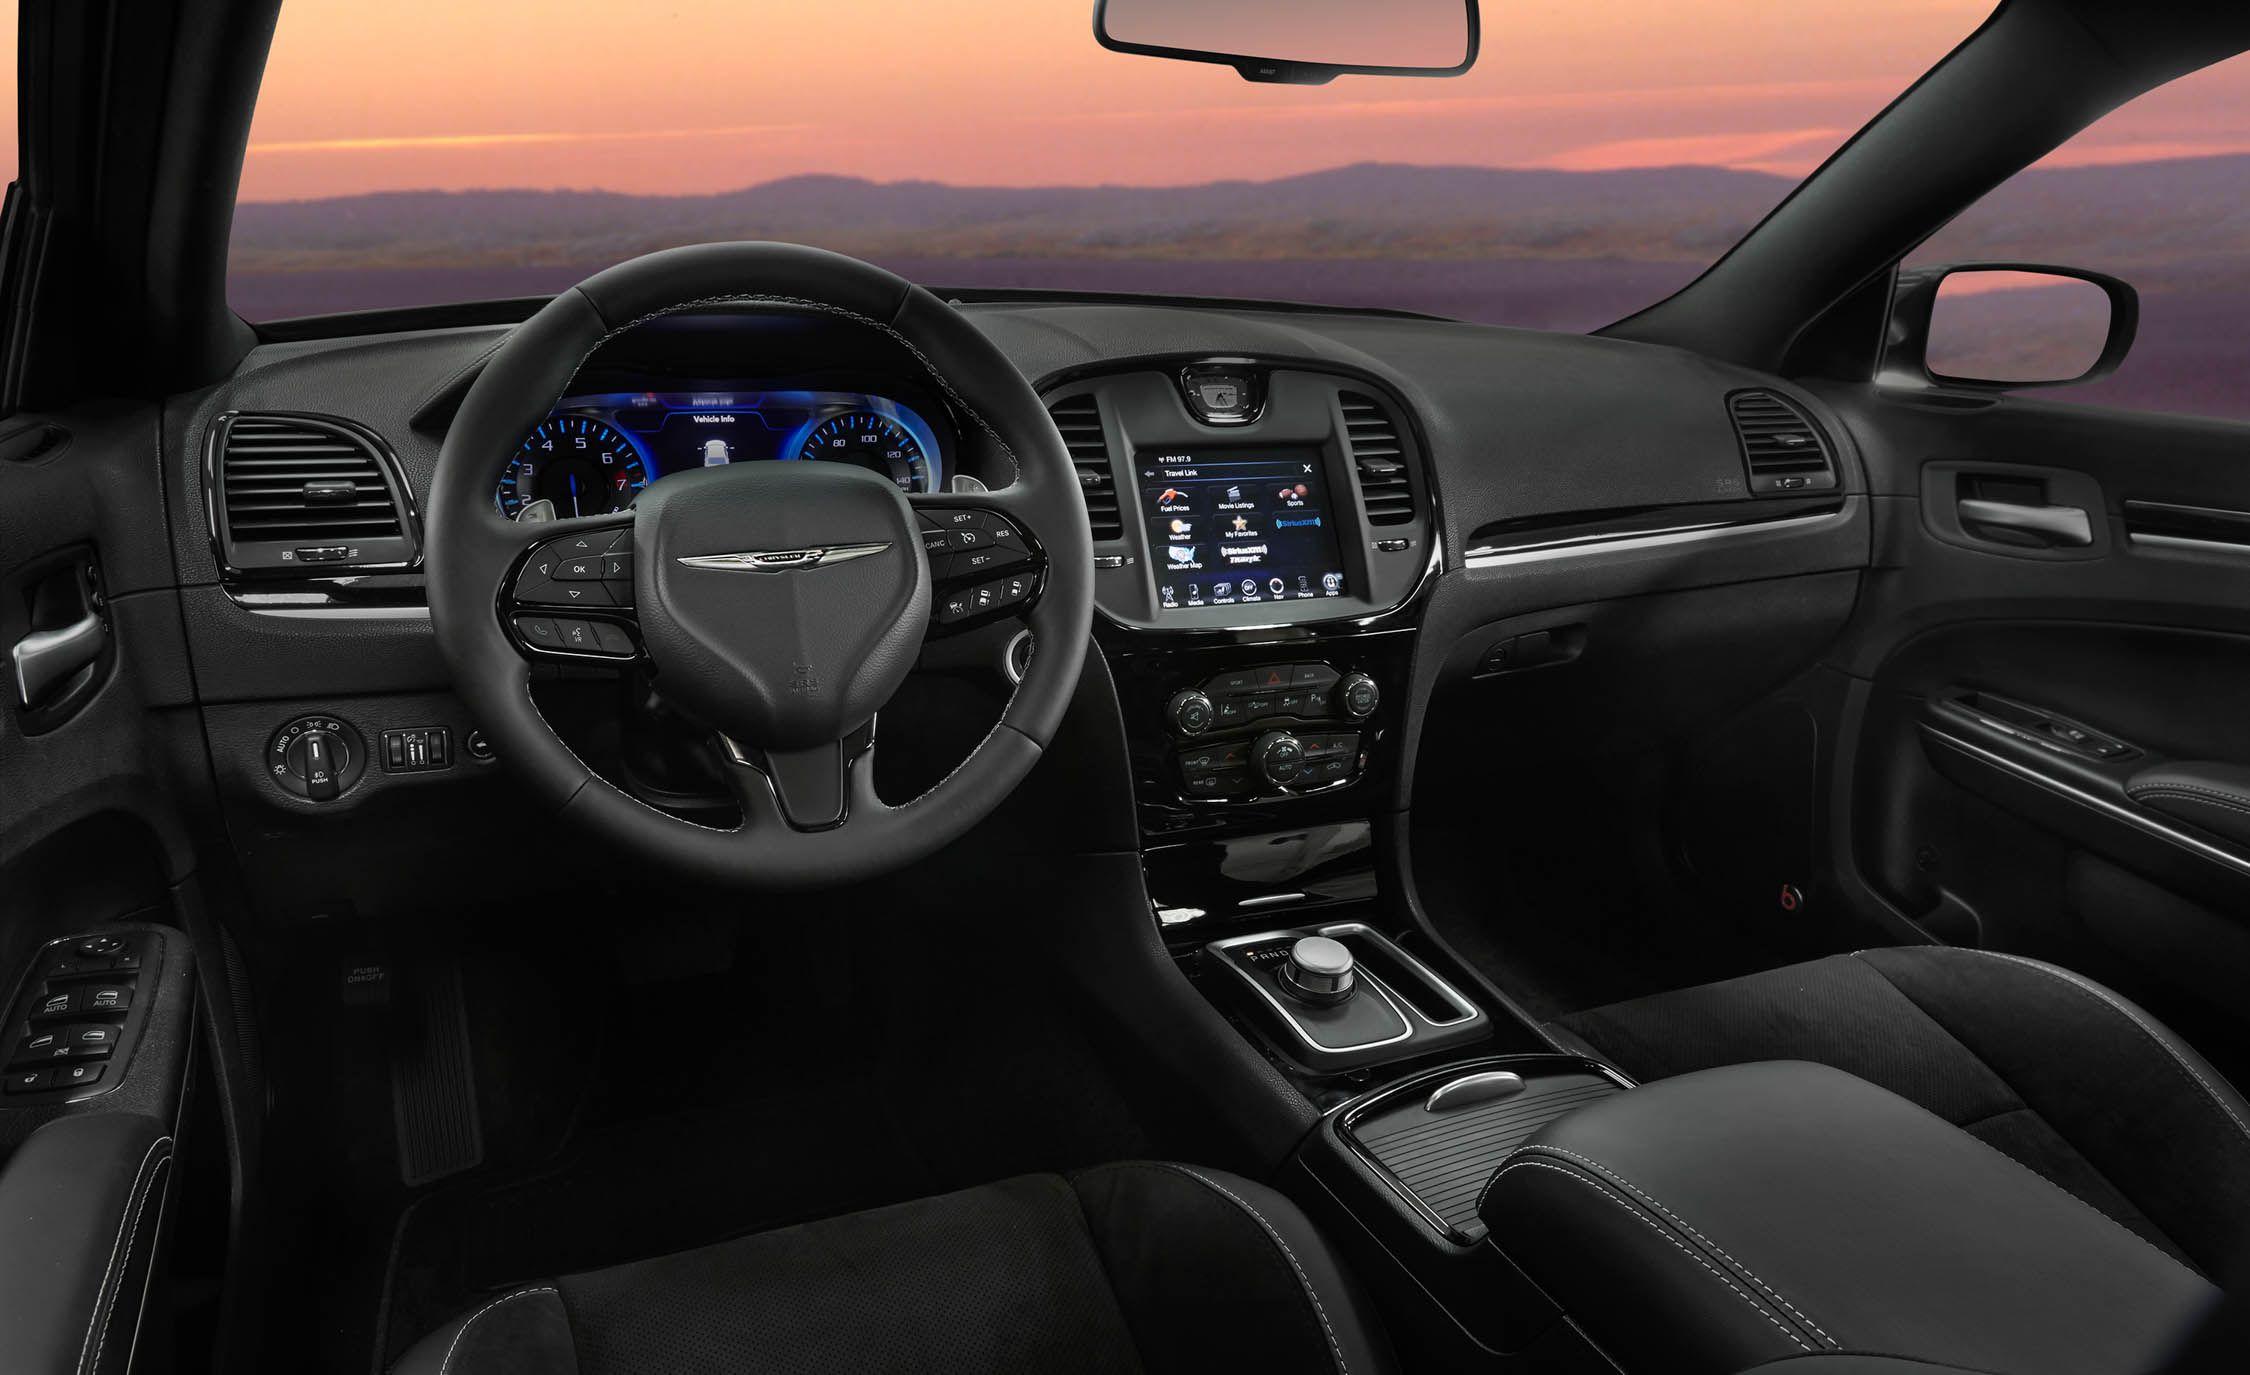 Chrysler 300s 2017 Price >> 2019 Chrysler 300 Reviews Chrysler 300 Price Photos And Specs